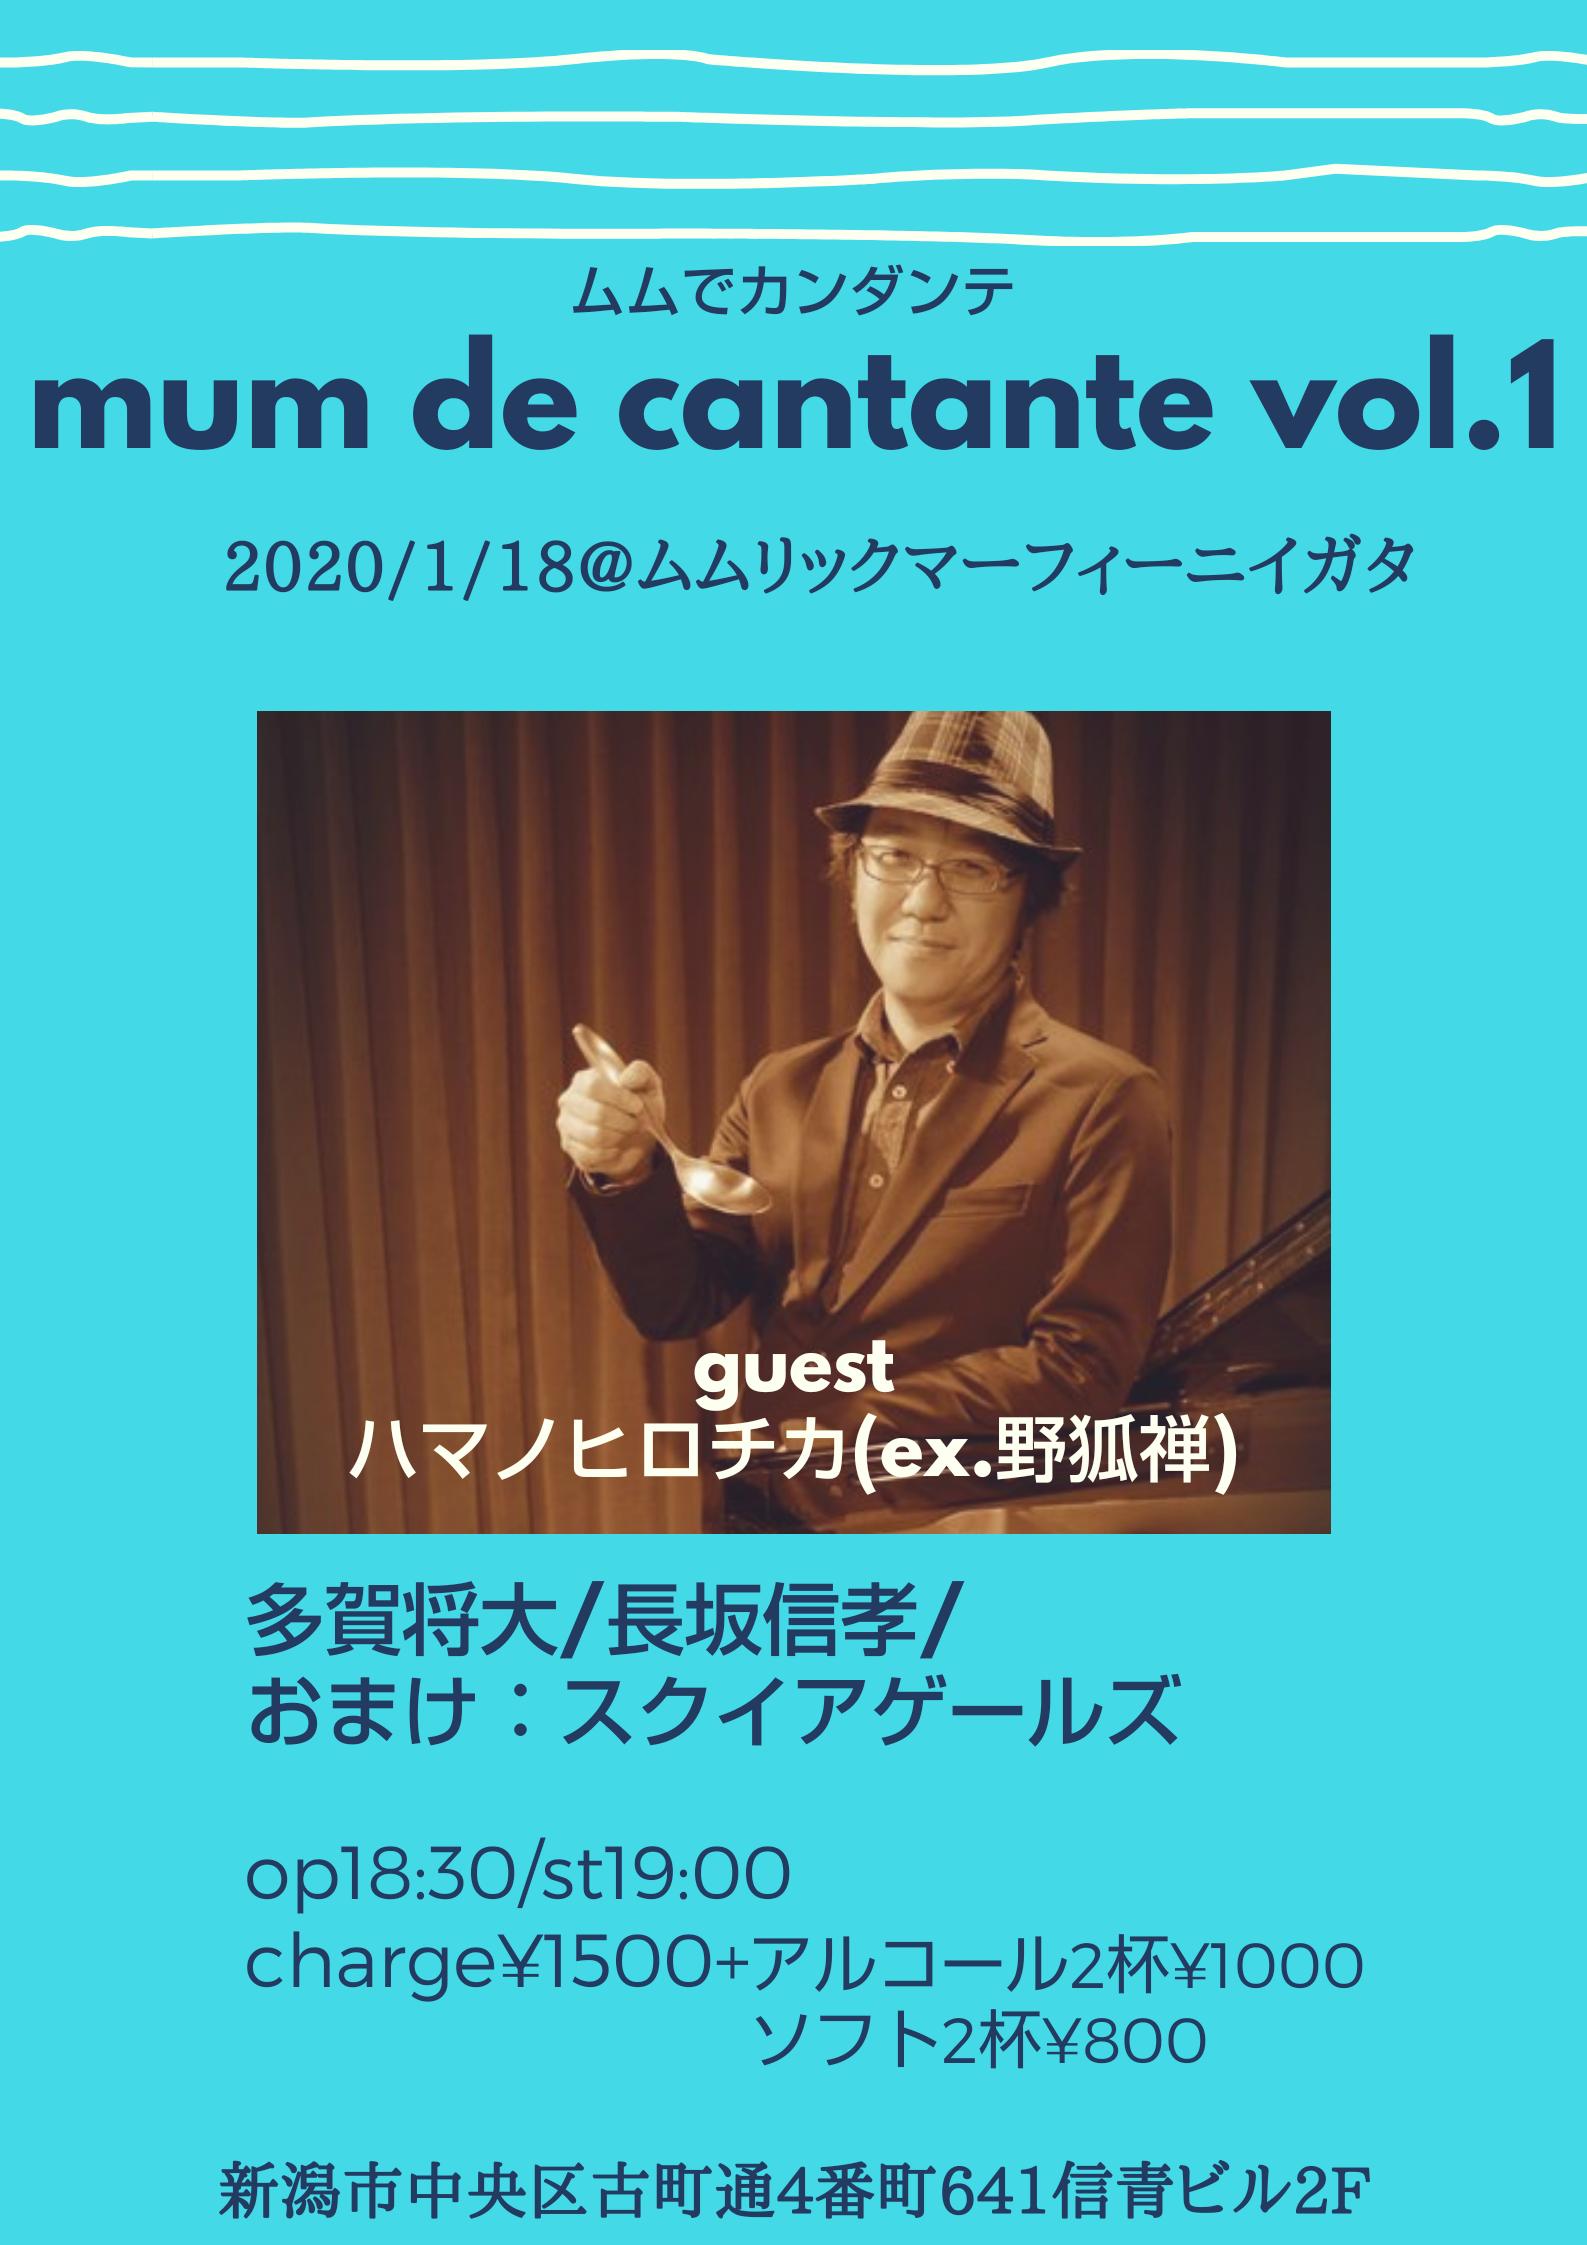 mum de cantante vol.1[ ムムでカンダンテ]